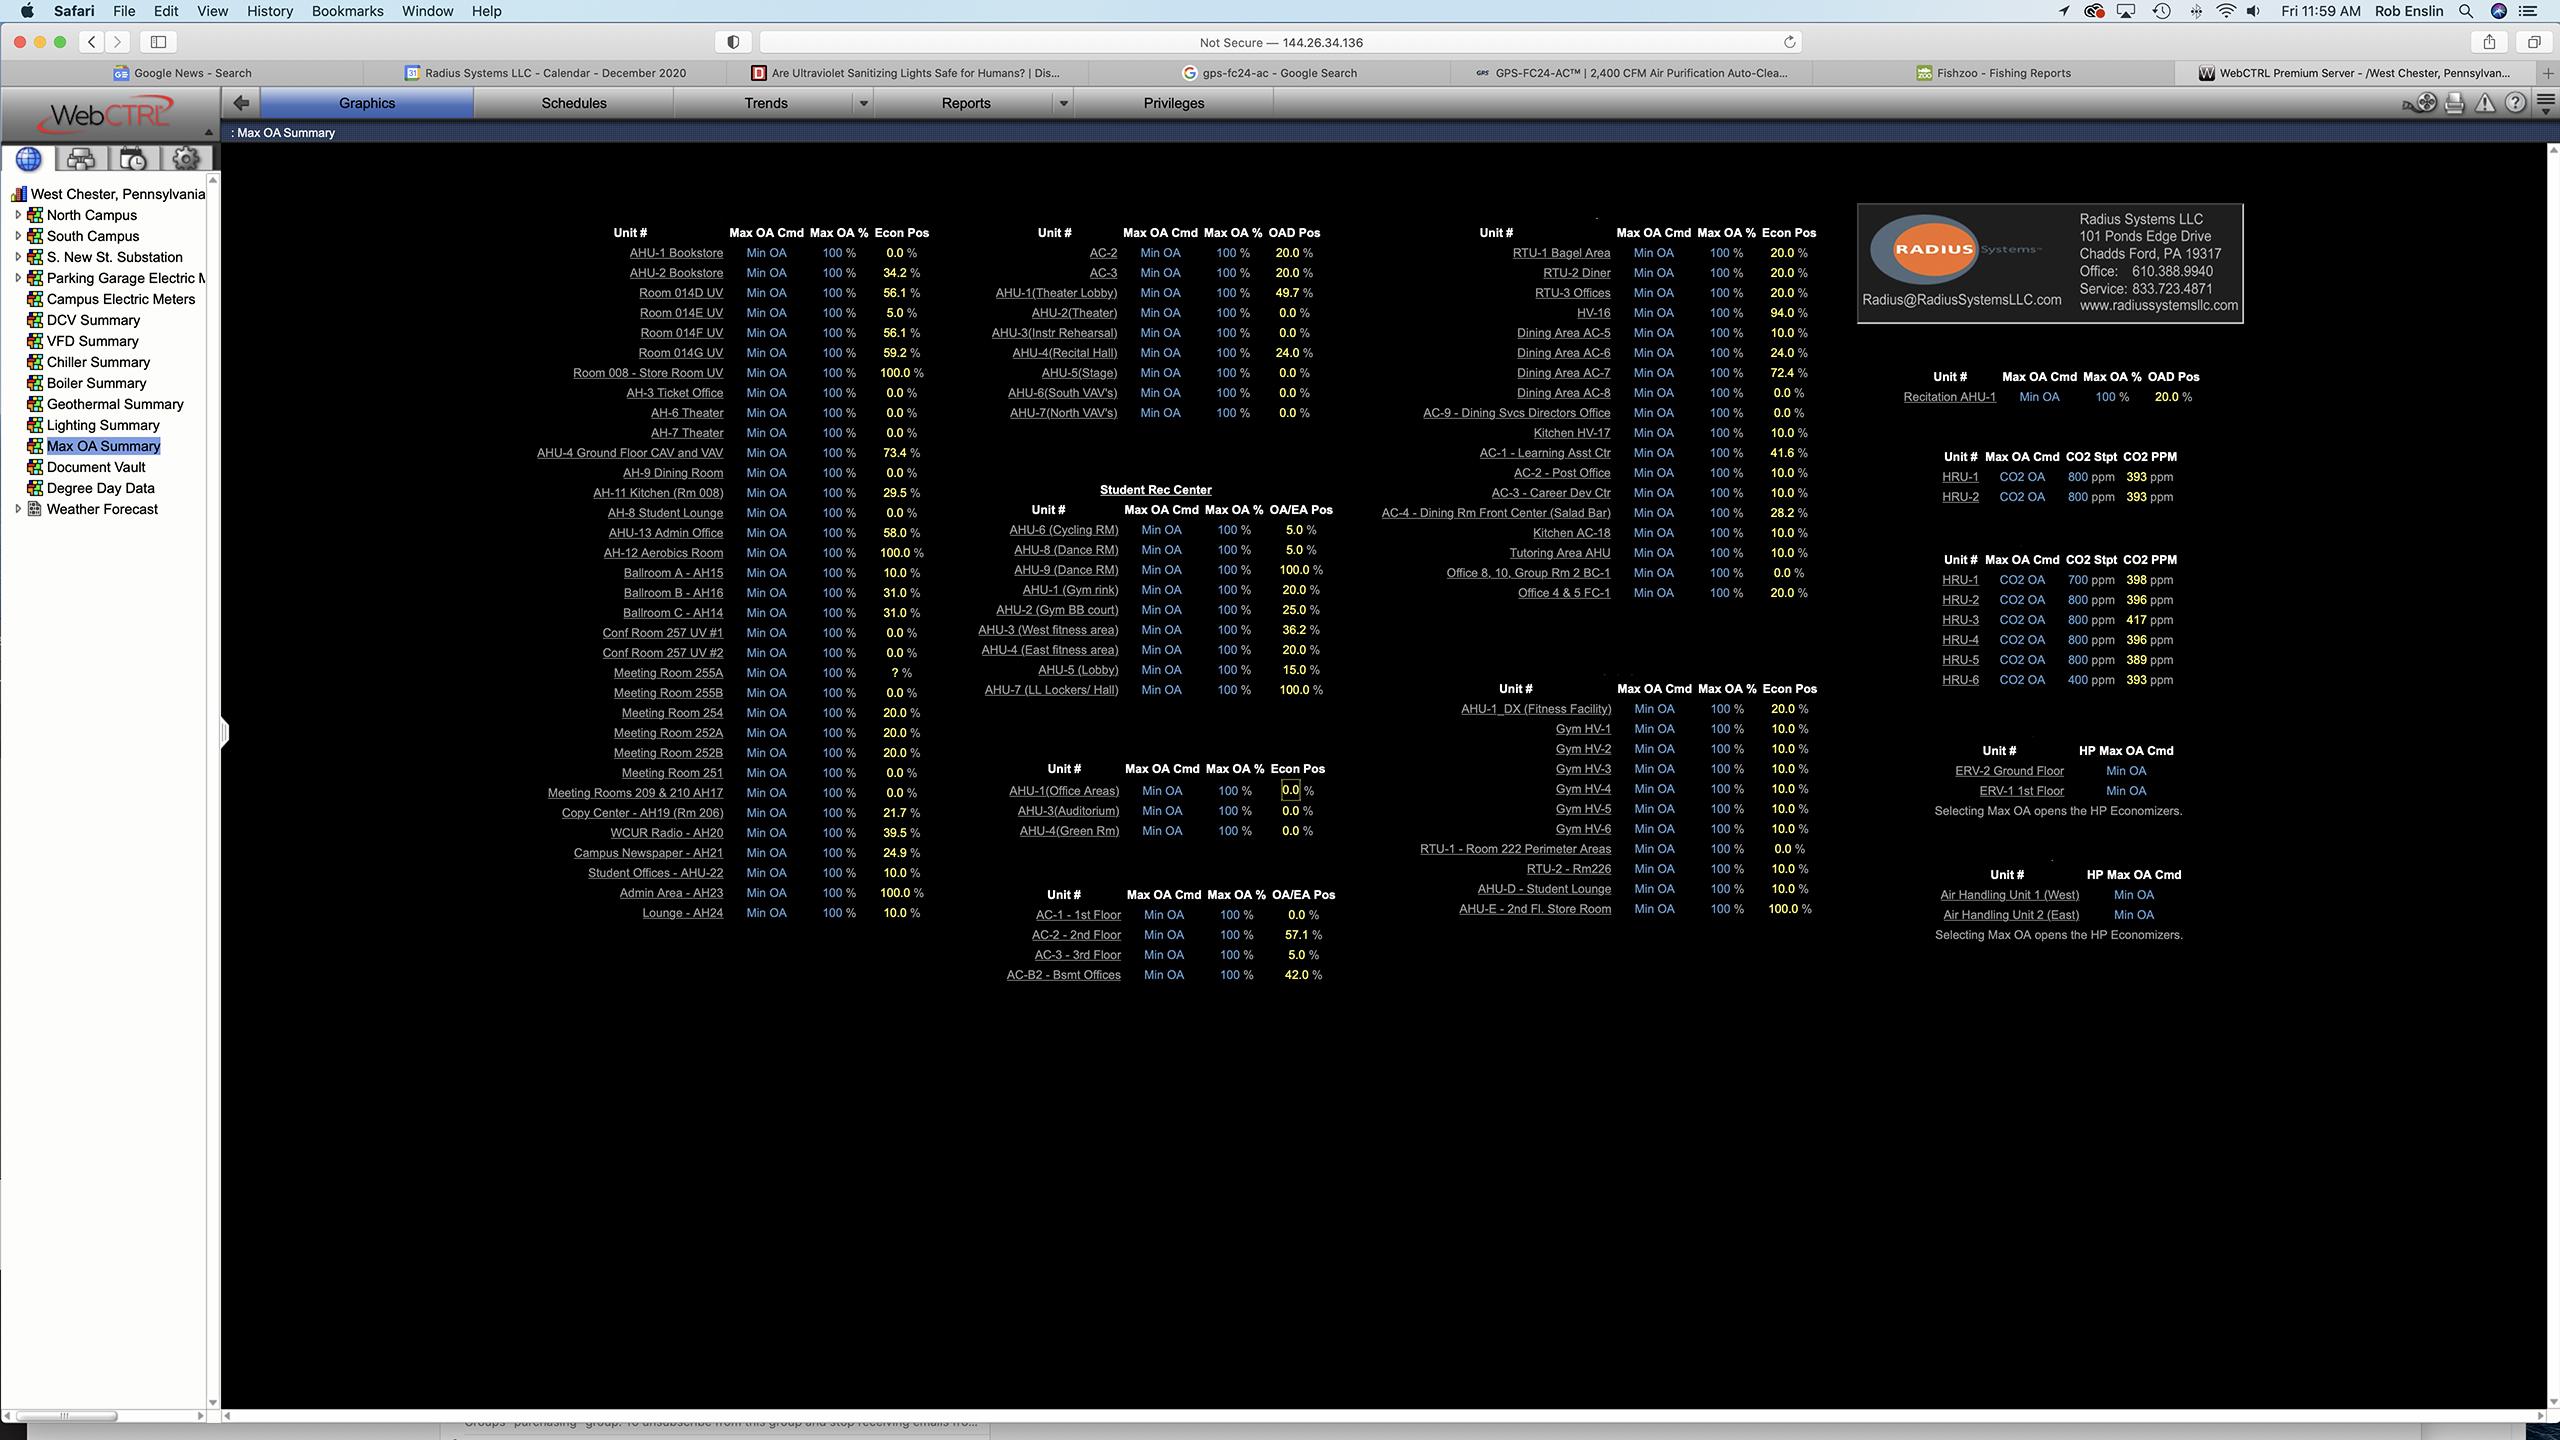 WebCTRL, Automated Logic, ALC, Radius Systems, Ventilation